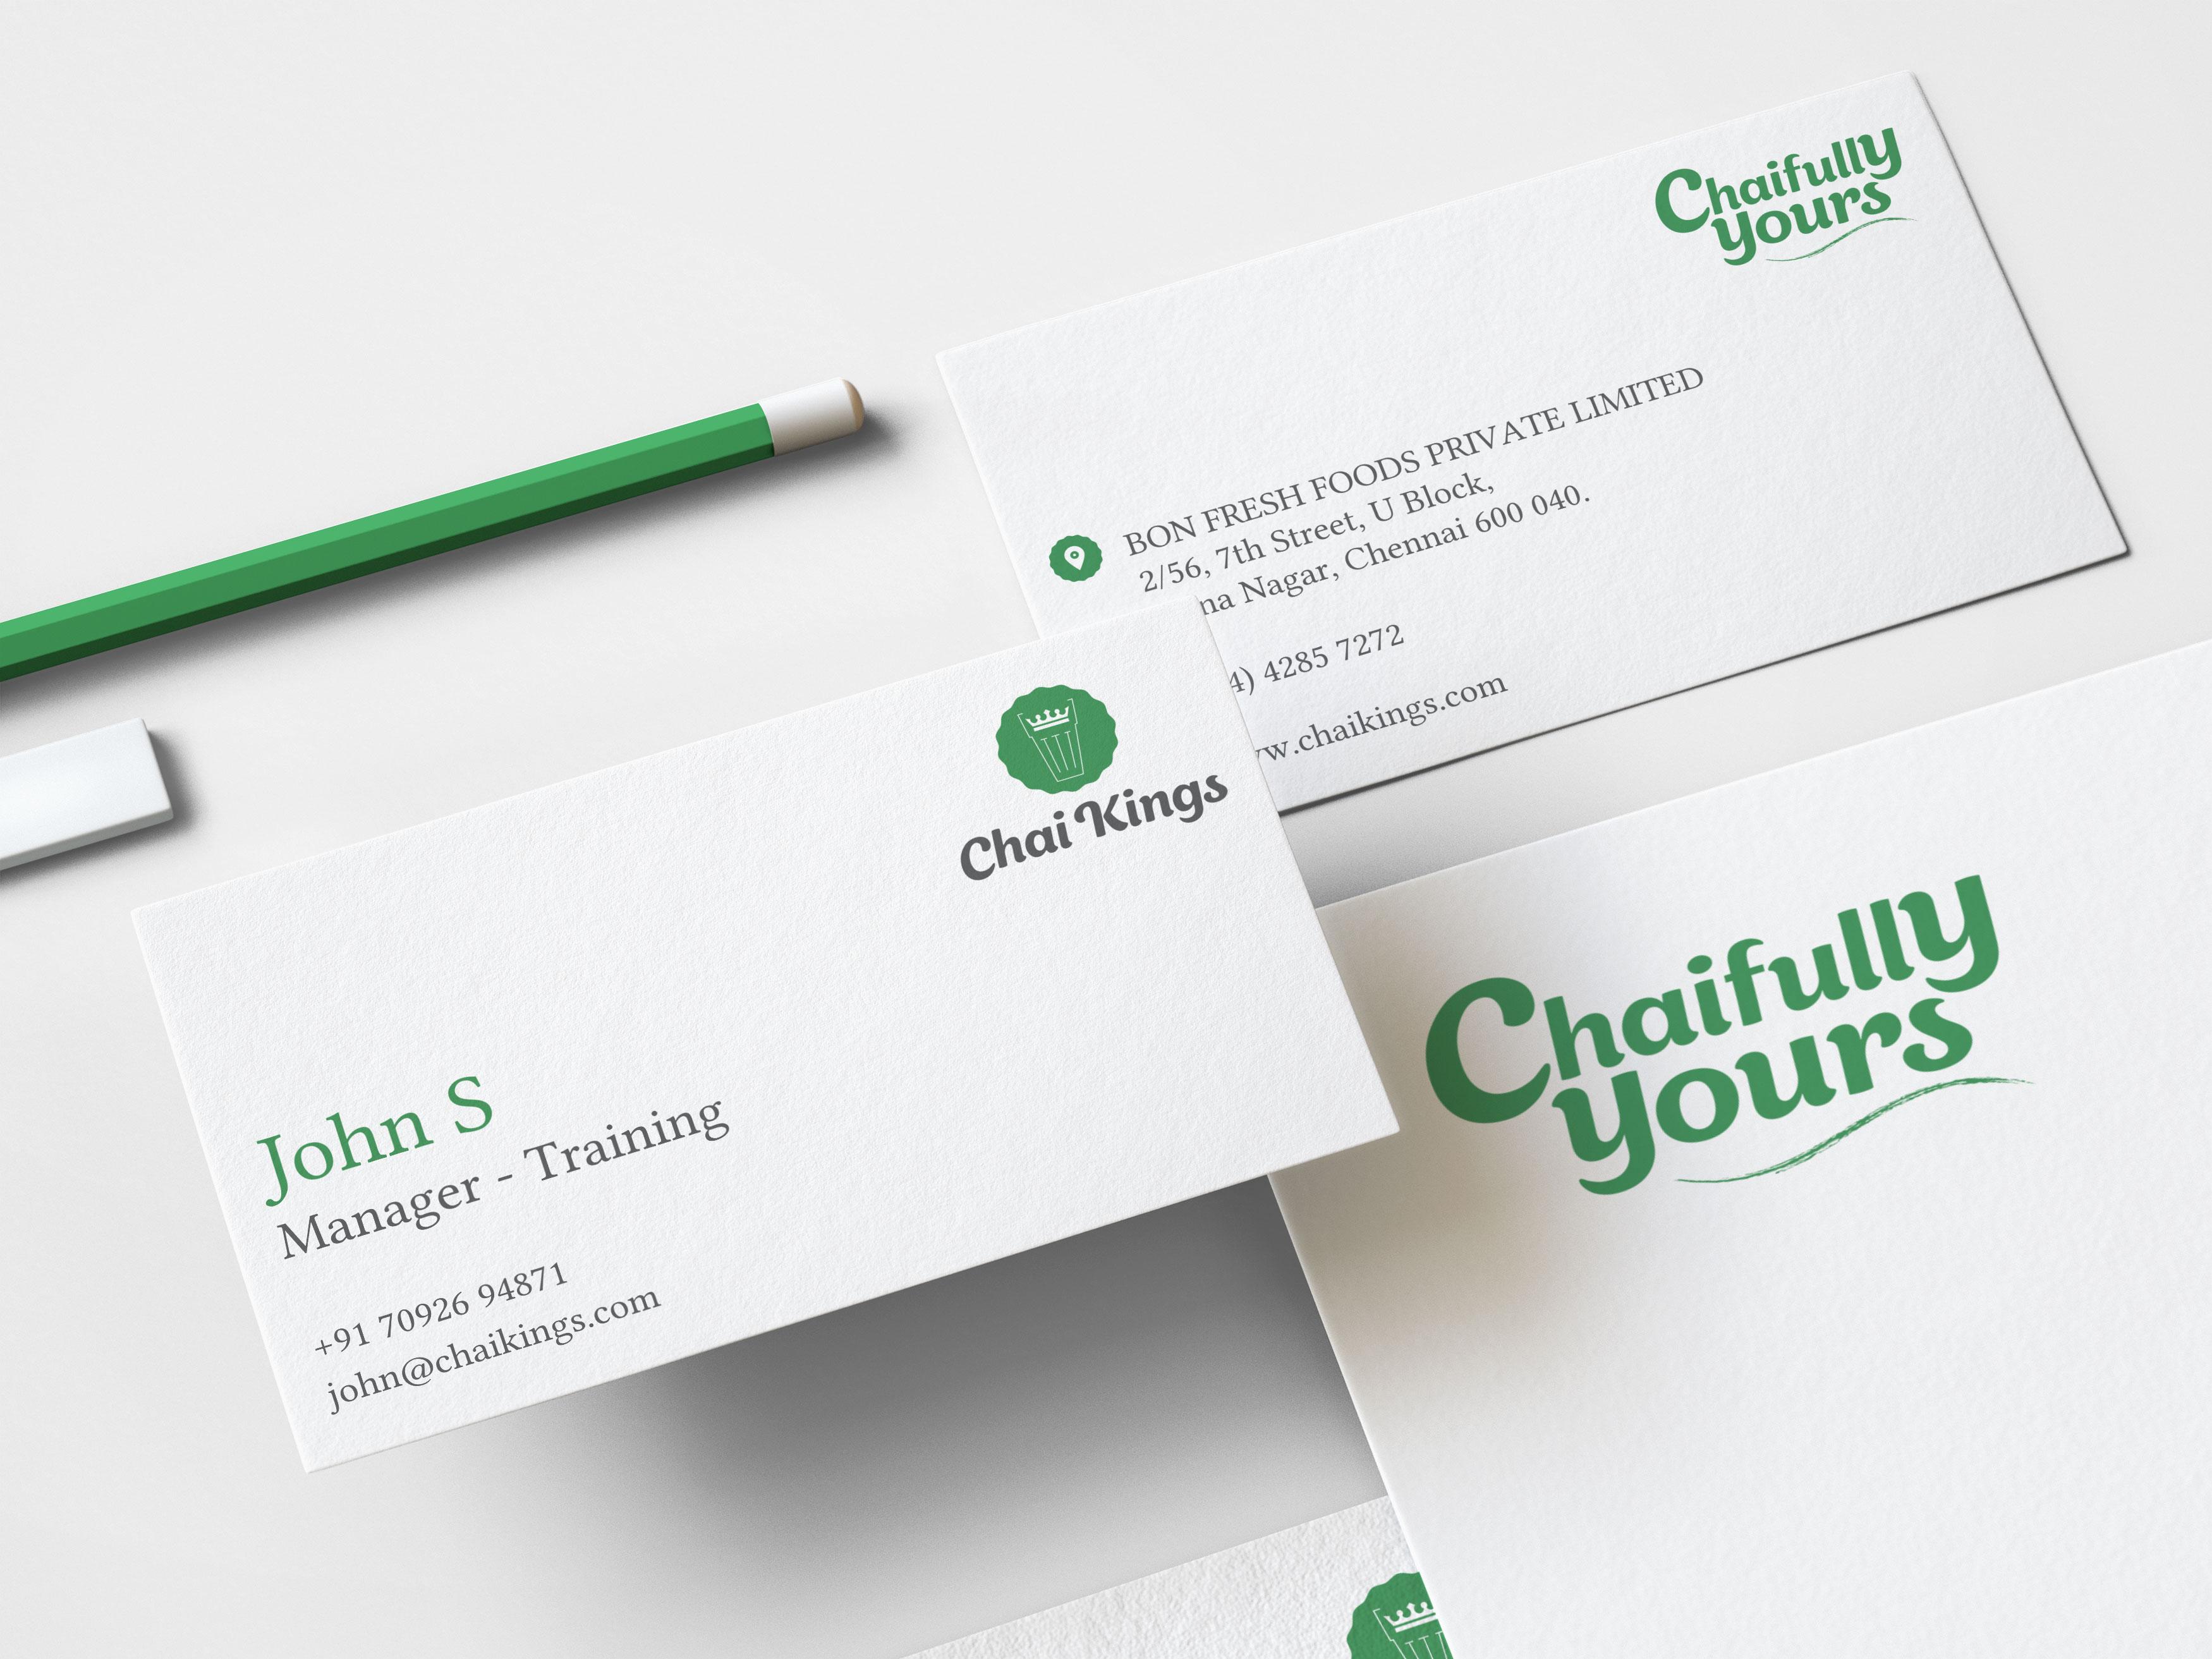 Chai Kings Business Card